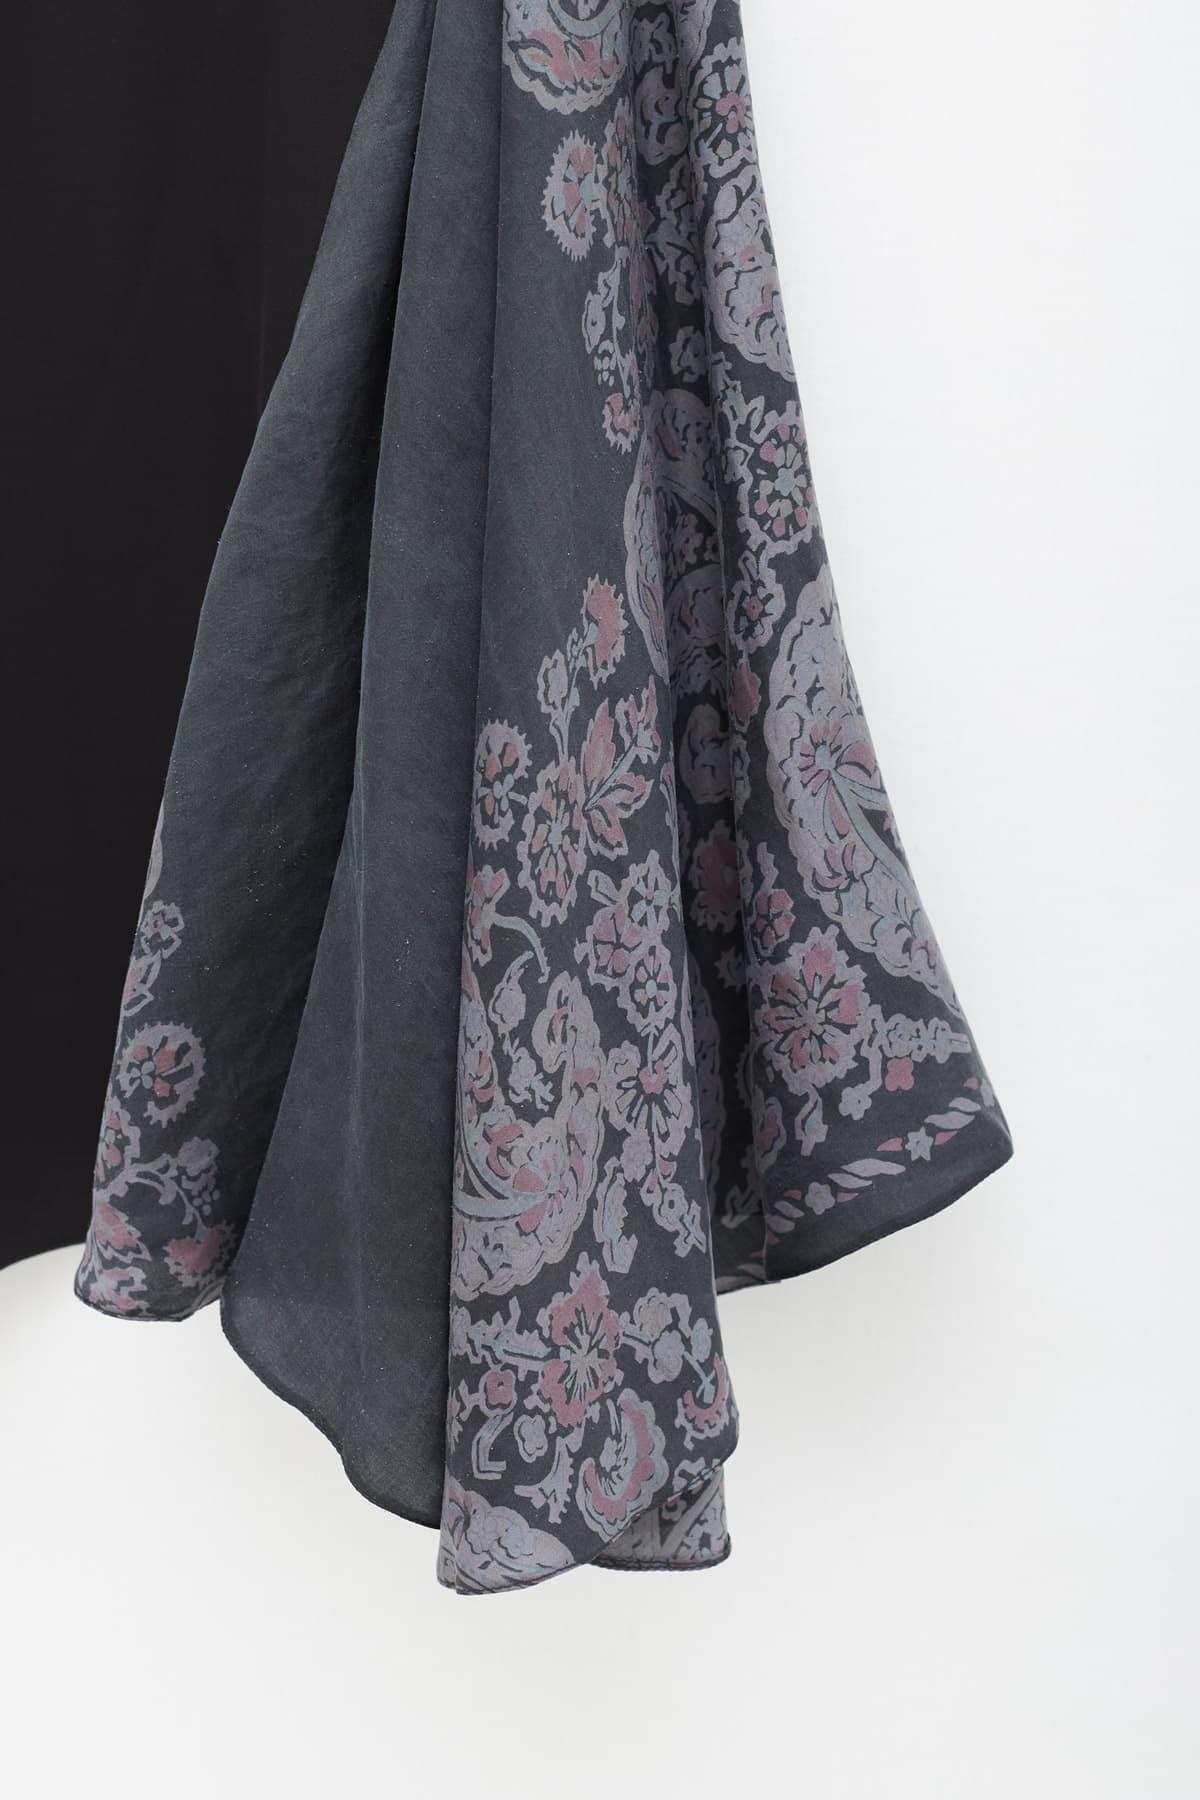 Comprar Maison Kitsuné Navy Fox Head Classic Sweatshirt